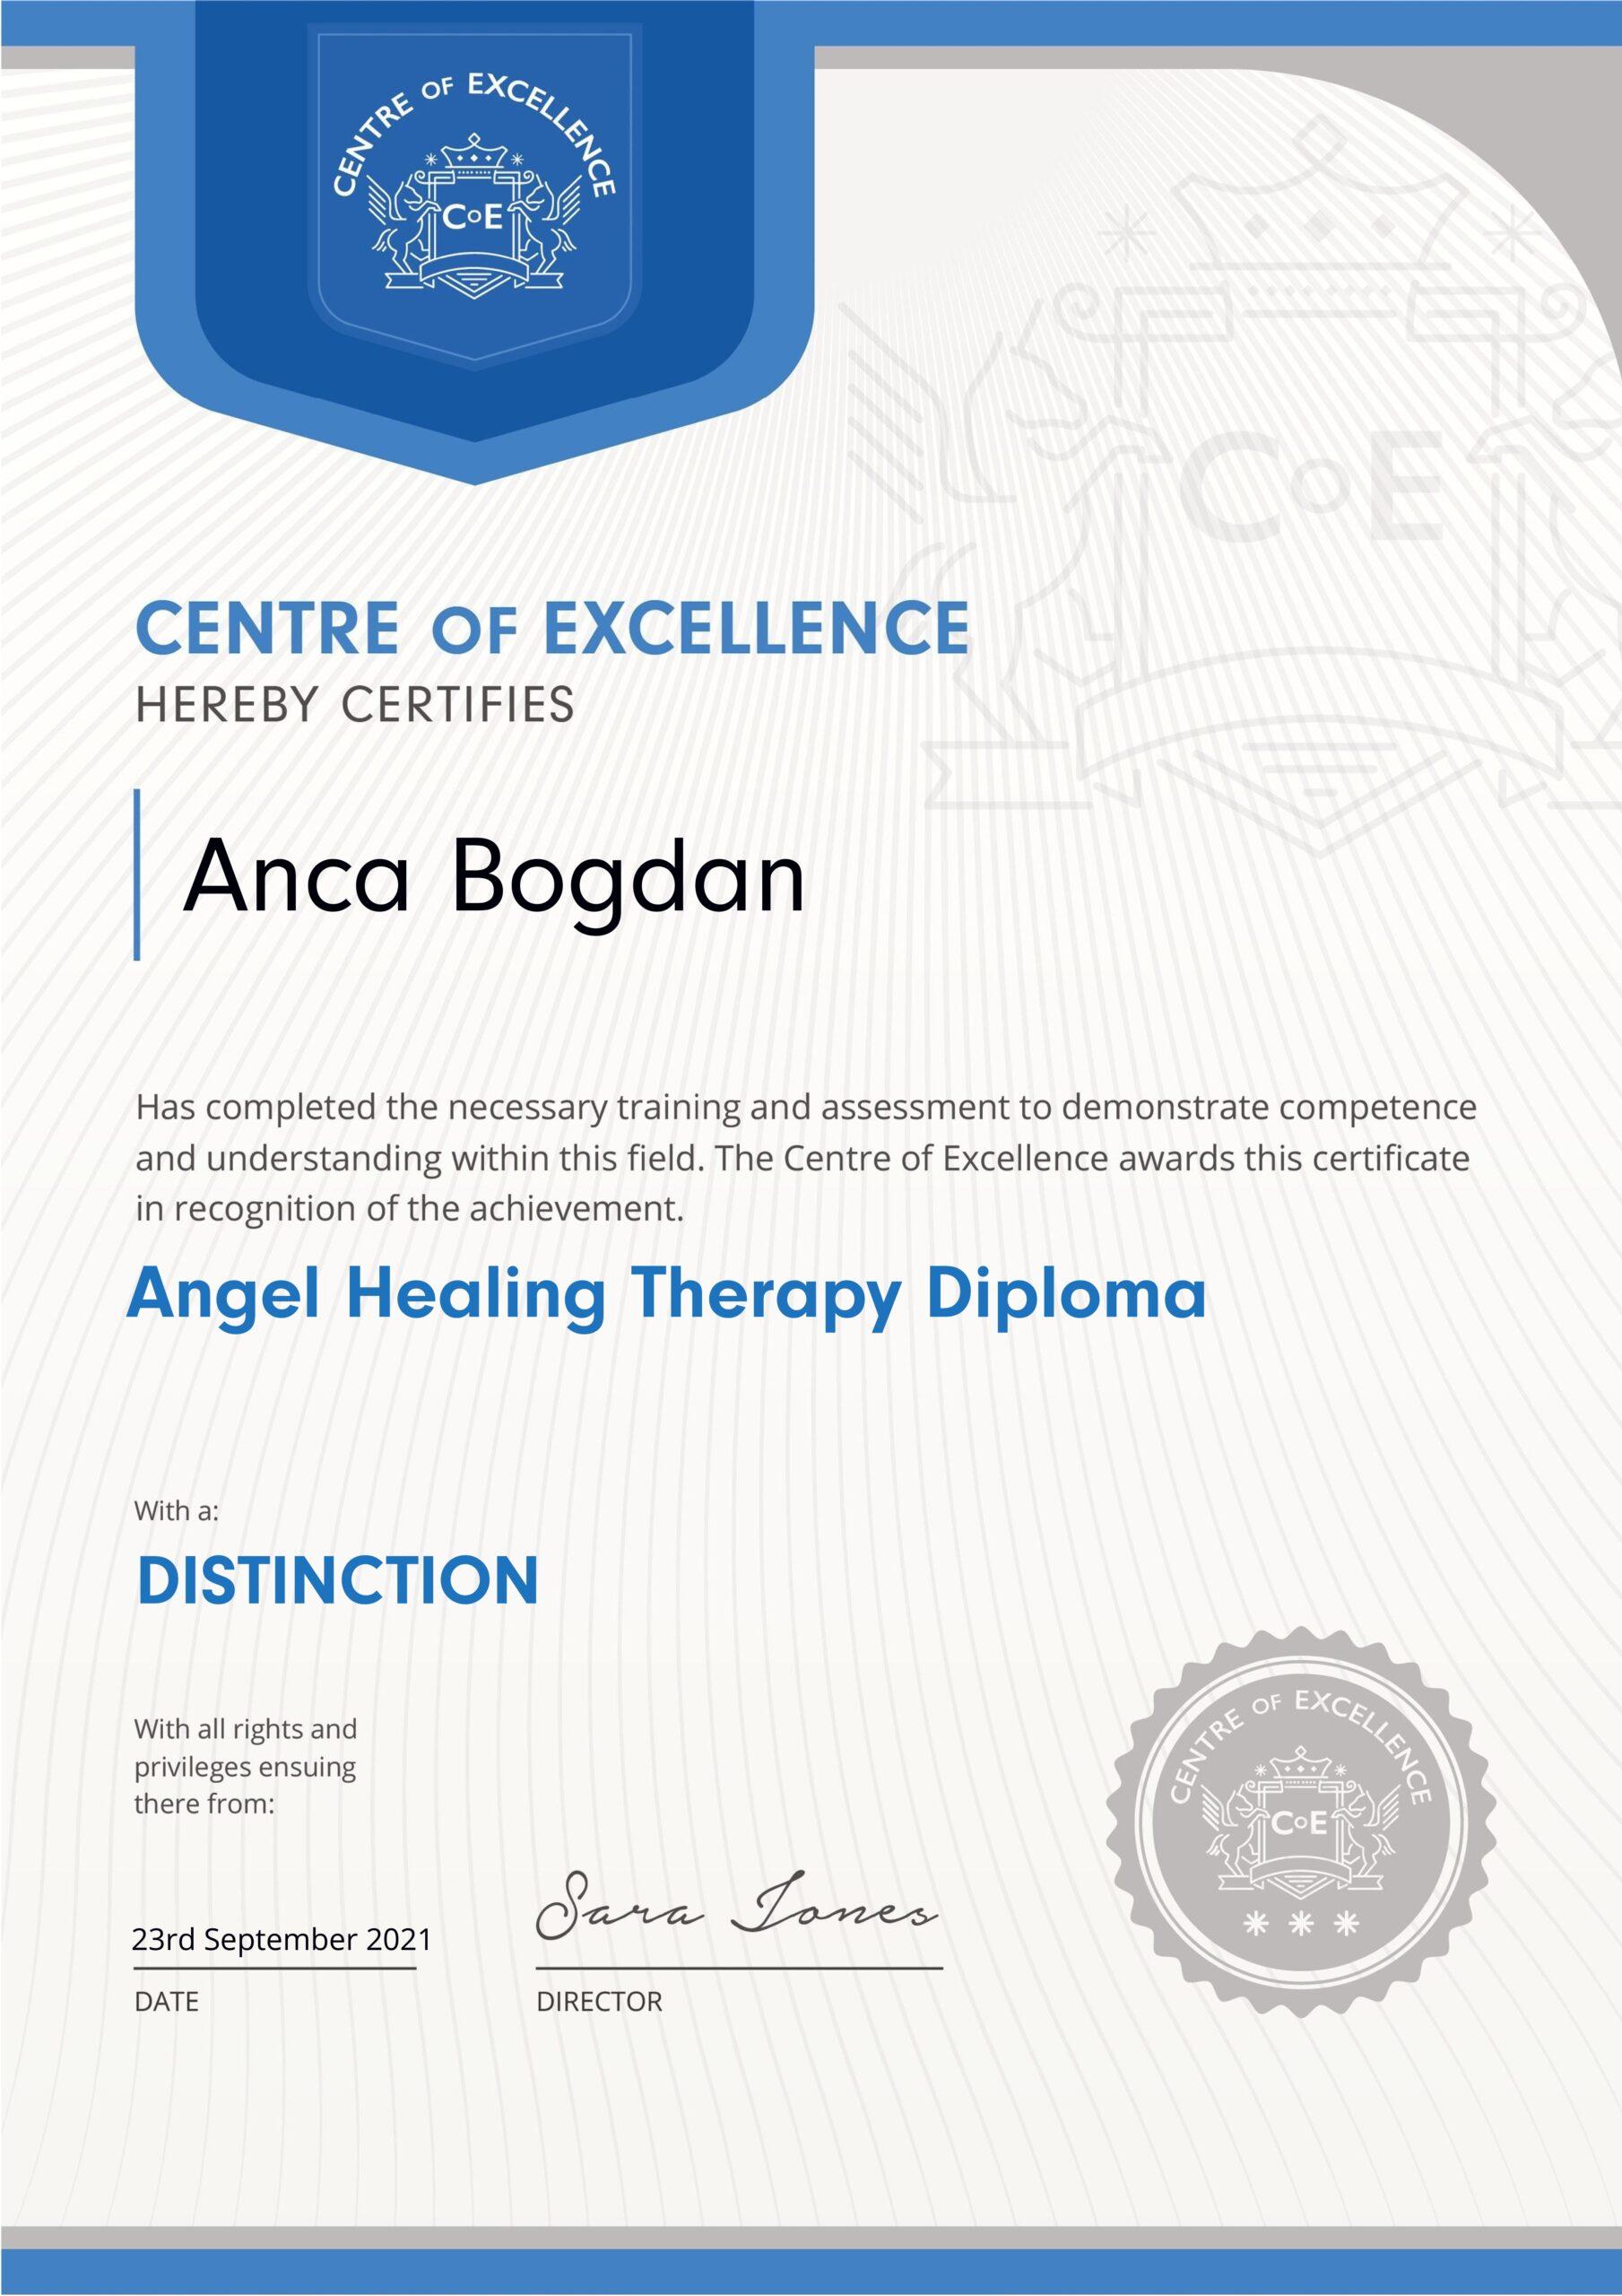 Angel-Healing-Therapy-Diploma_001